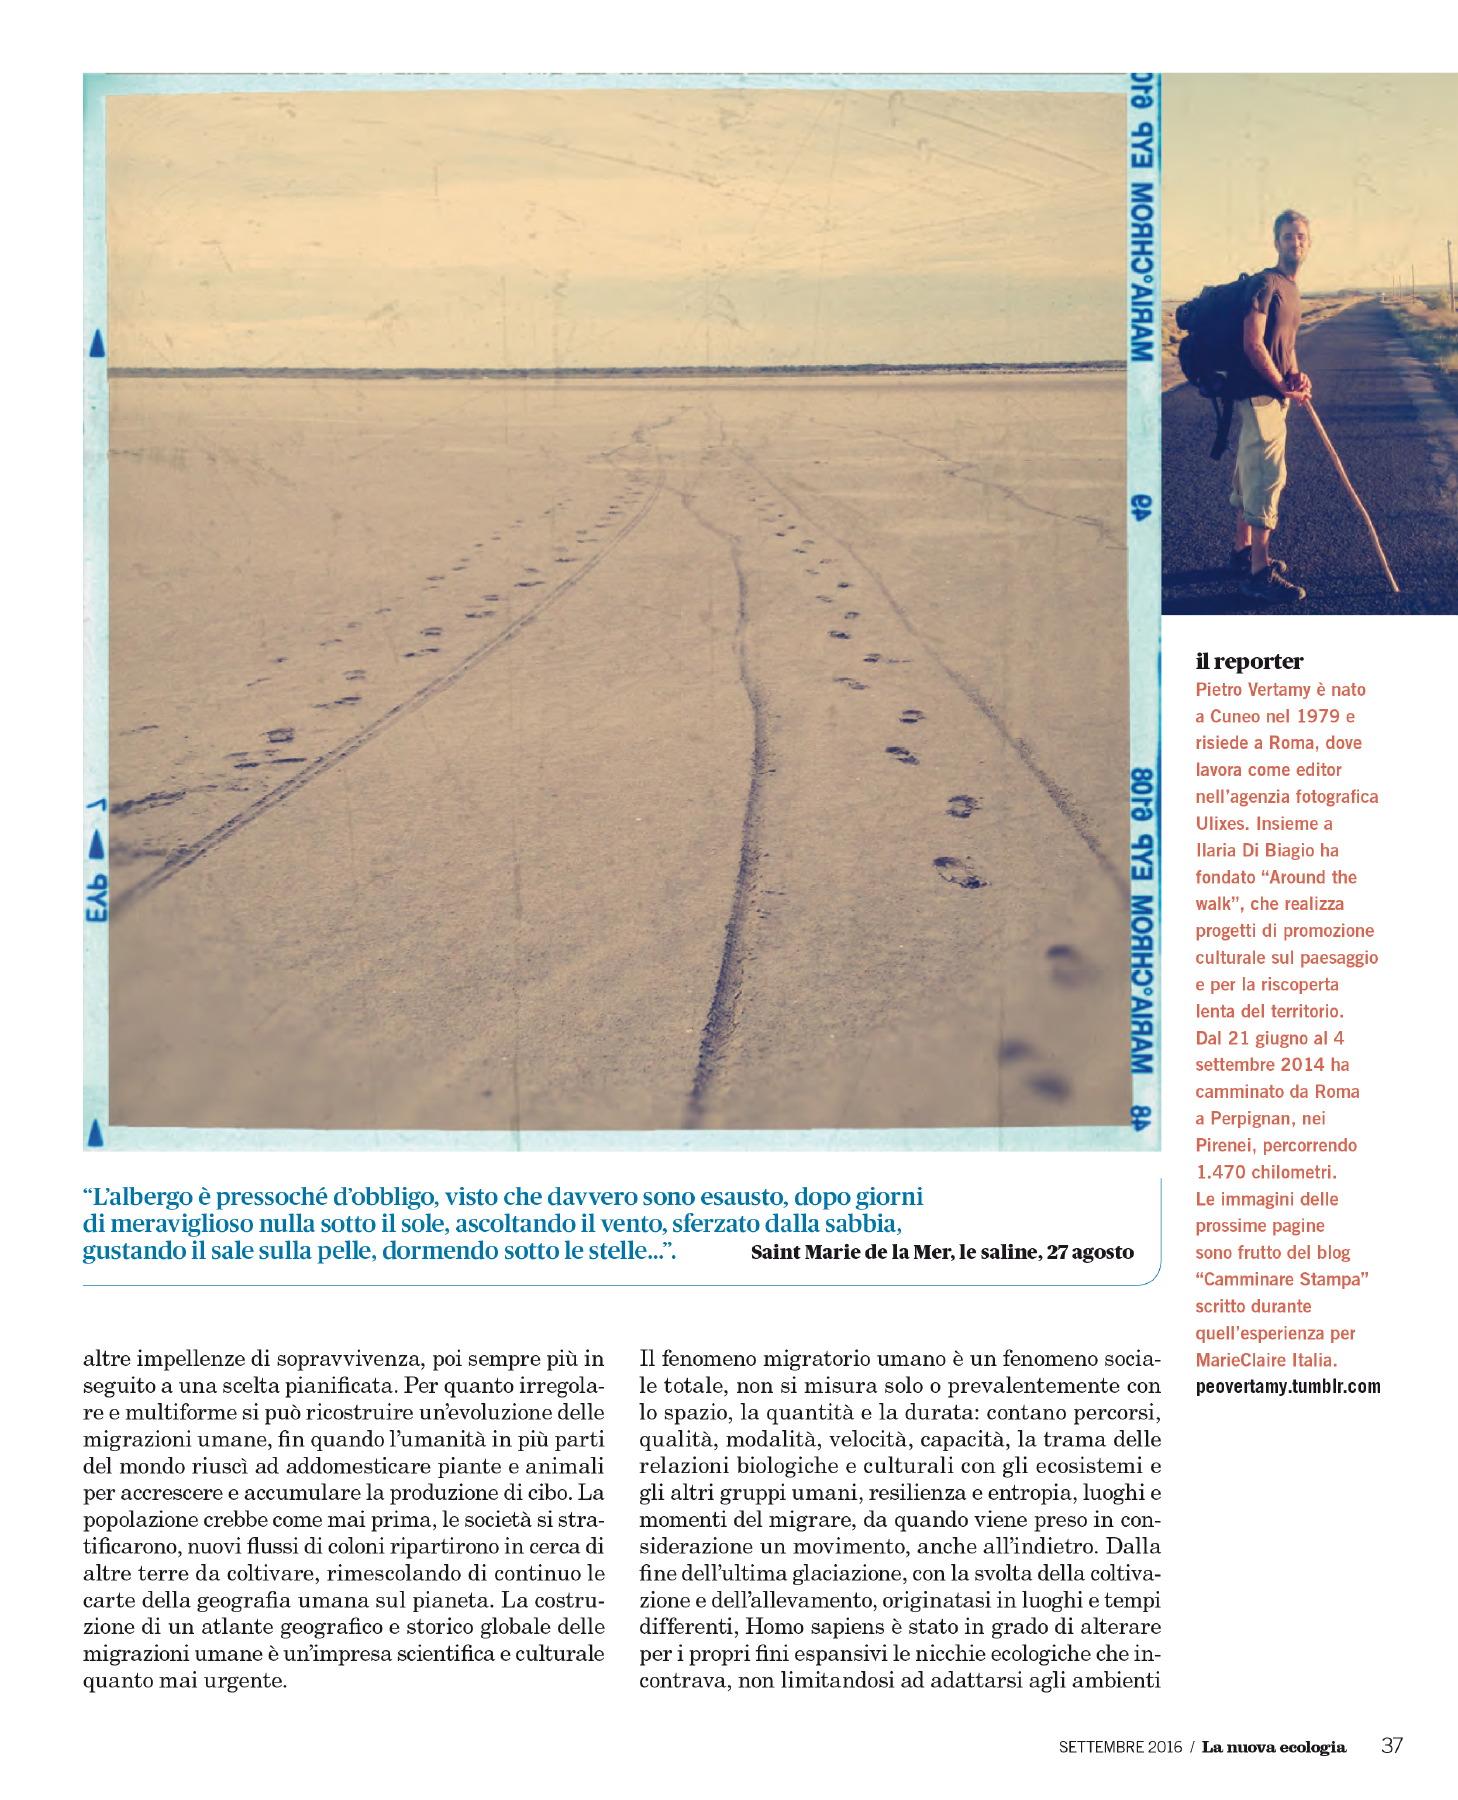 around-the-walk-_-pietro-vertamy-_tearsheet-nuova-ecologia-02